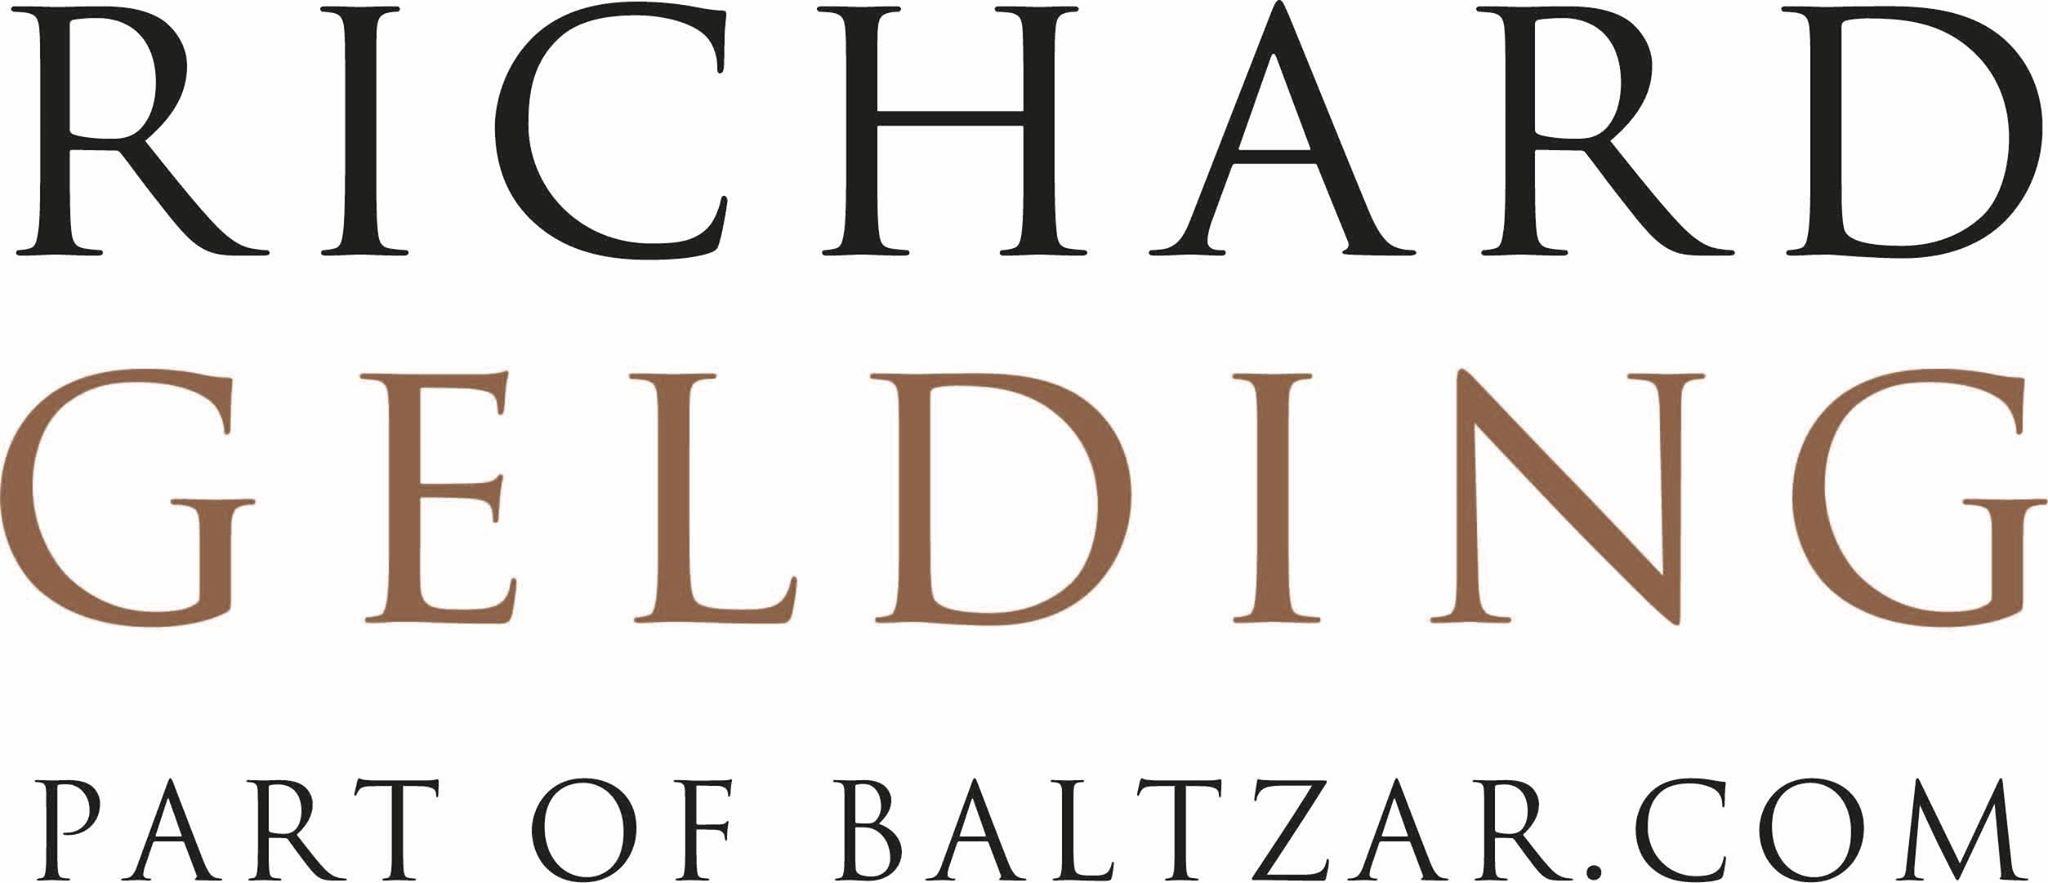 Richard Gelding Menswear | Part of baltzar.com